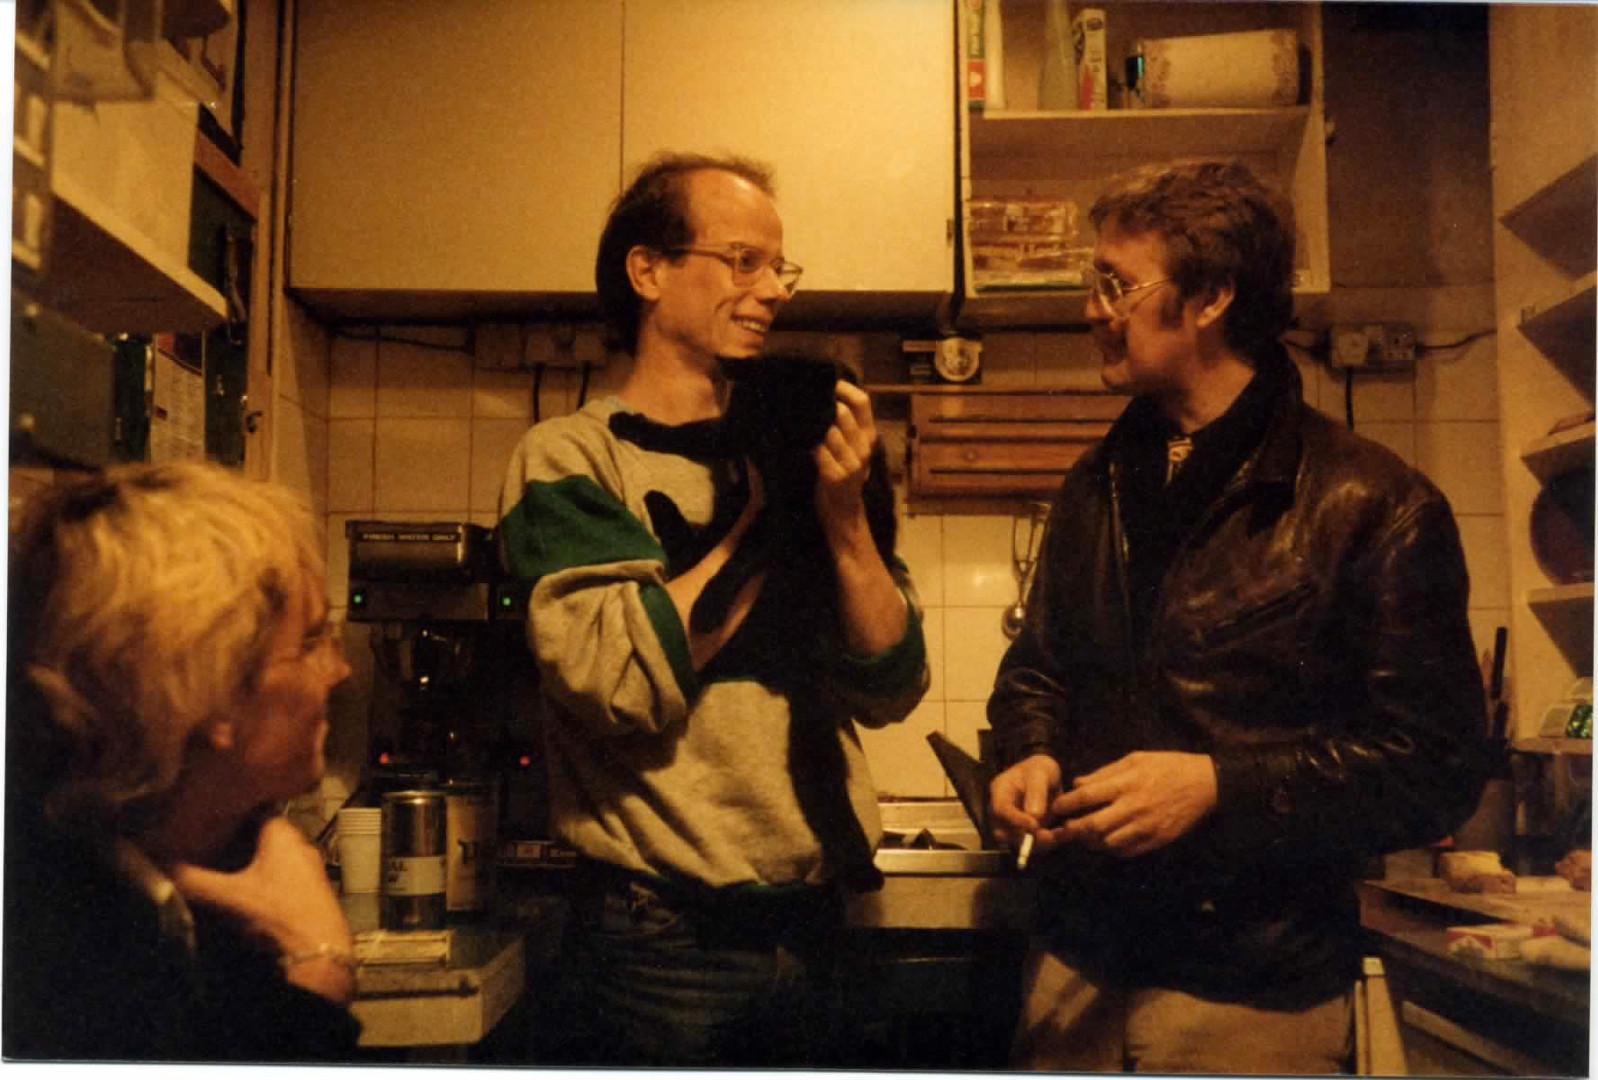 Terry Abernethy, Bob Mellors holding Clint, Jim Nelson.